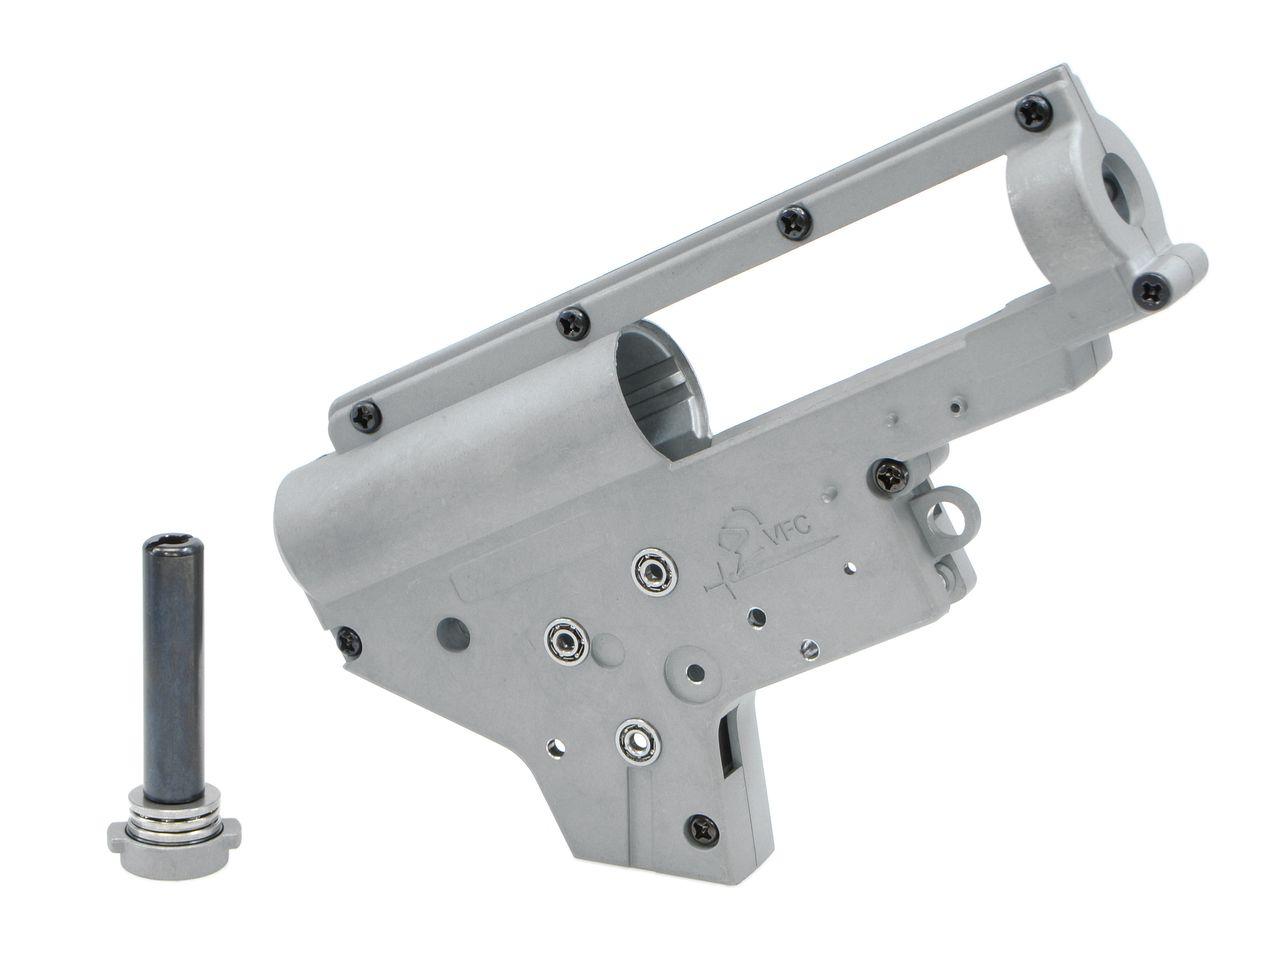 VFC 強化ギアボックスケース/8mm軸受け M16/M4用 ECS Ver.2.1